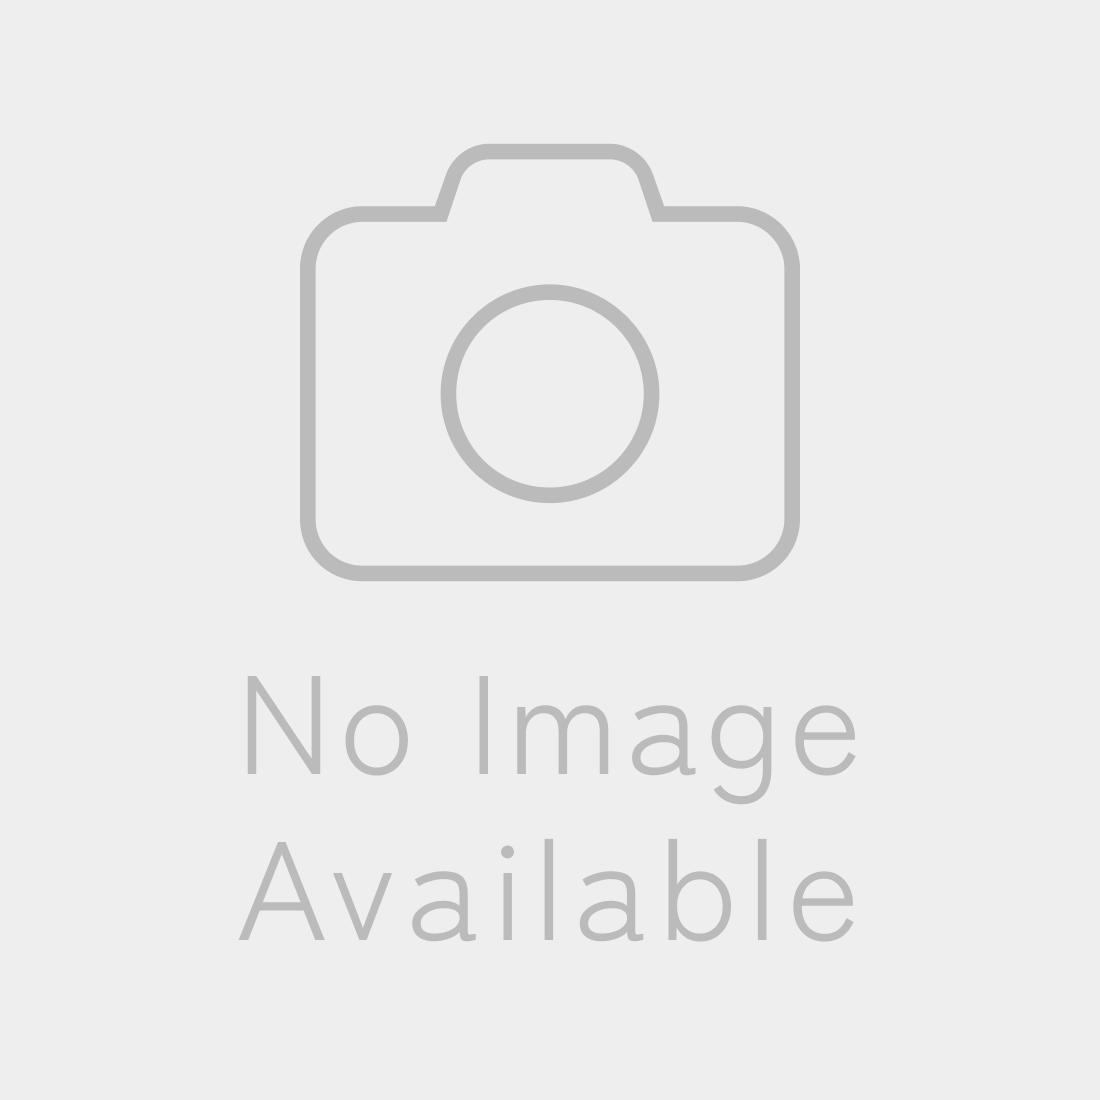 CSI82690021_020521